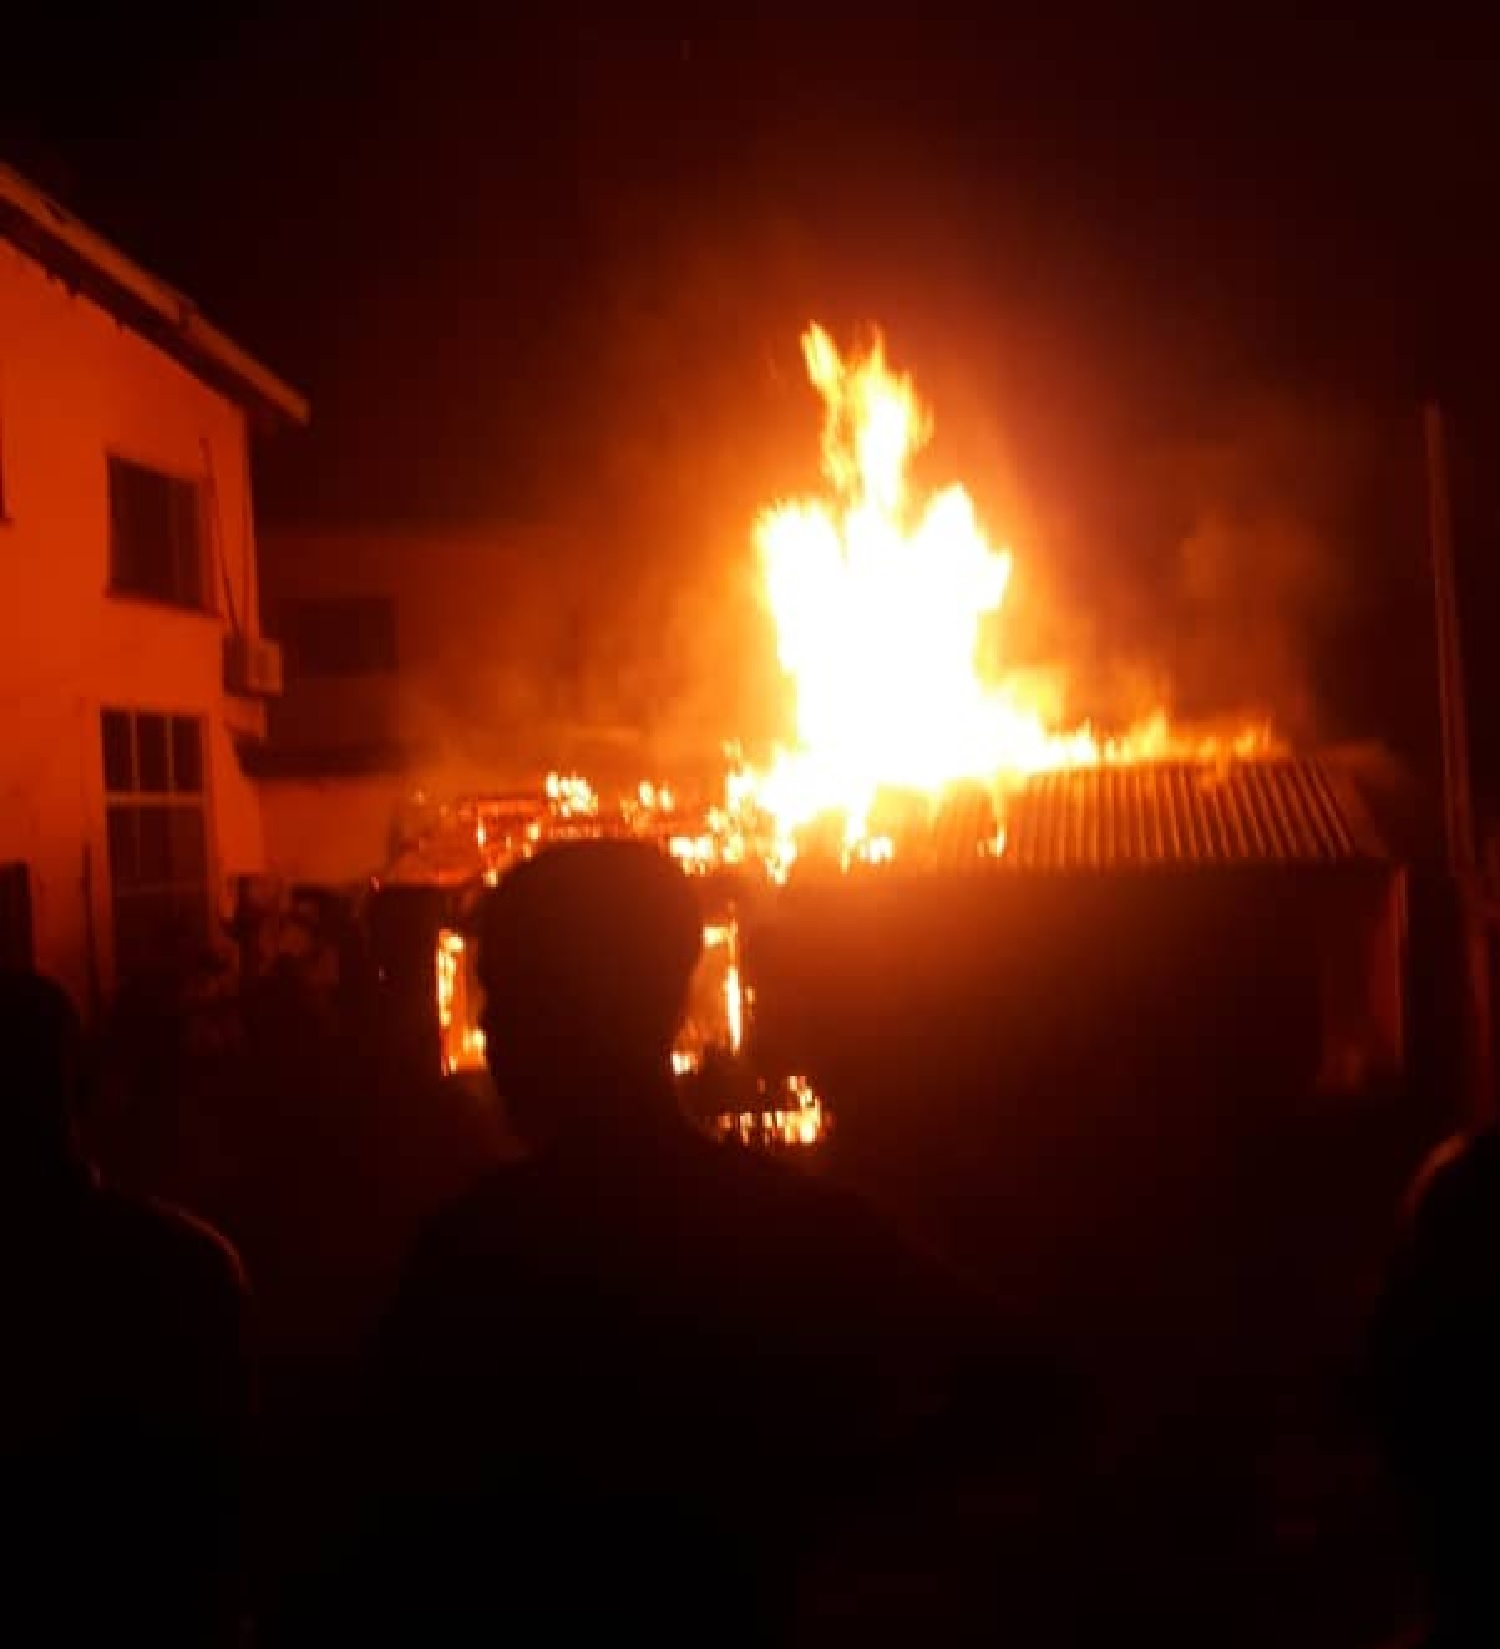 Fire guts illicit oil storage facility in Lagos